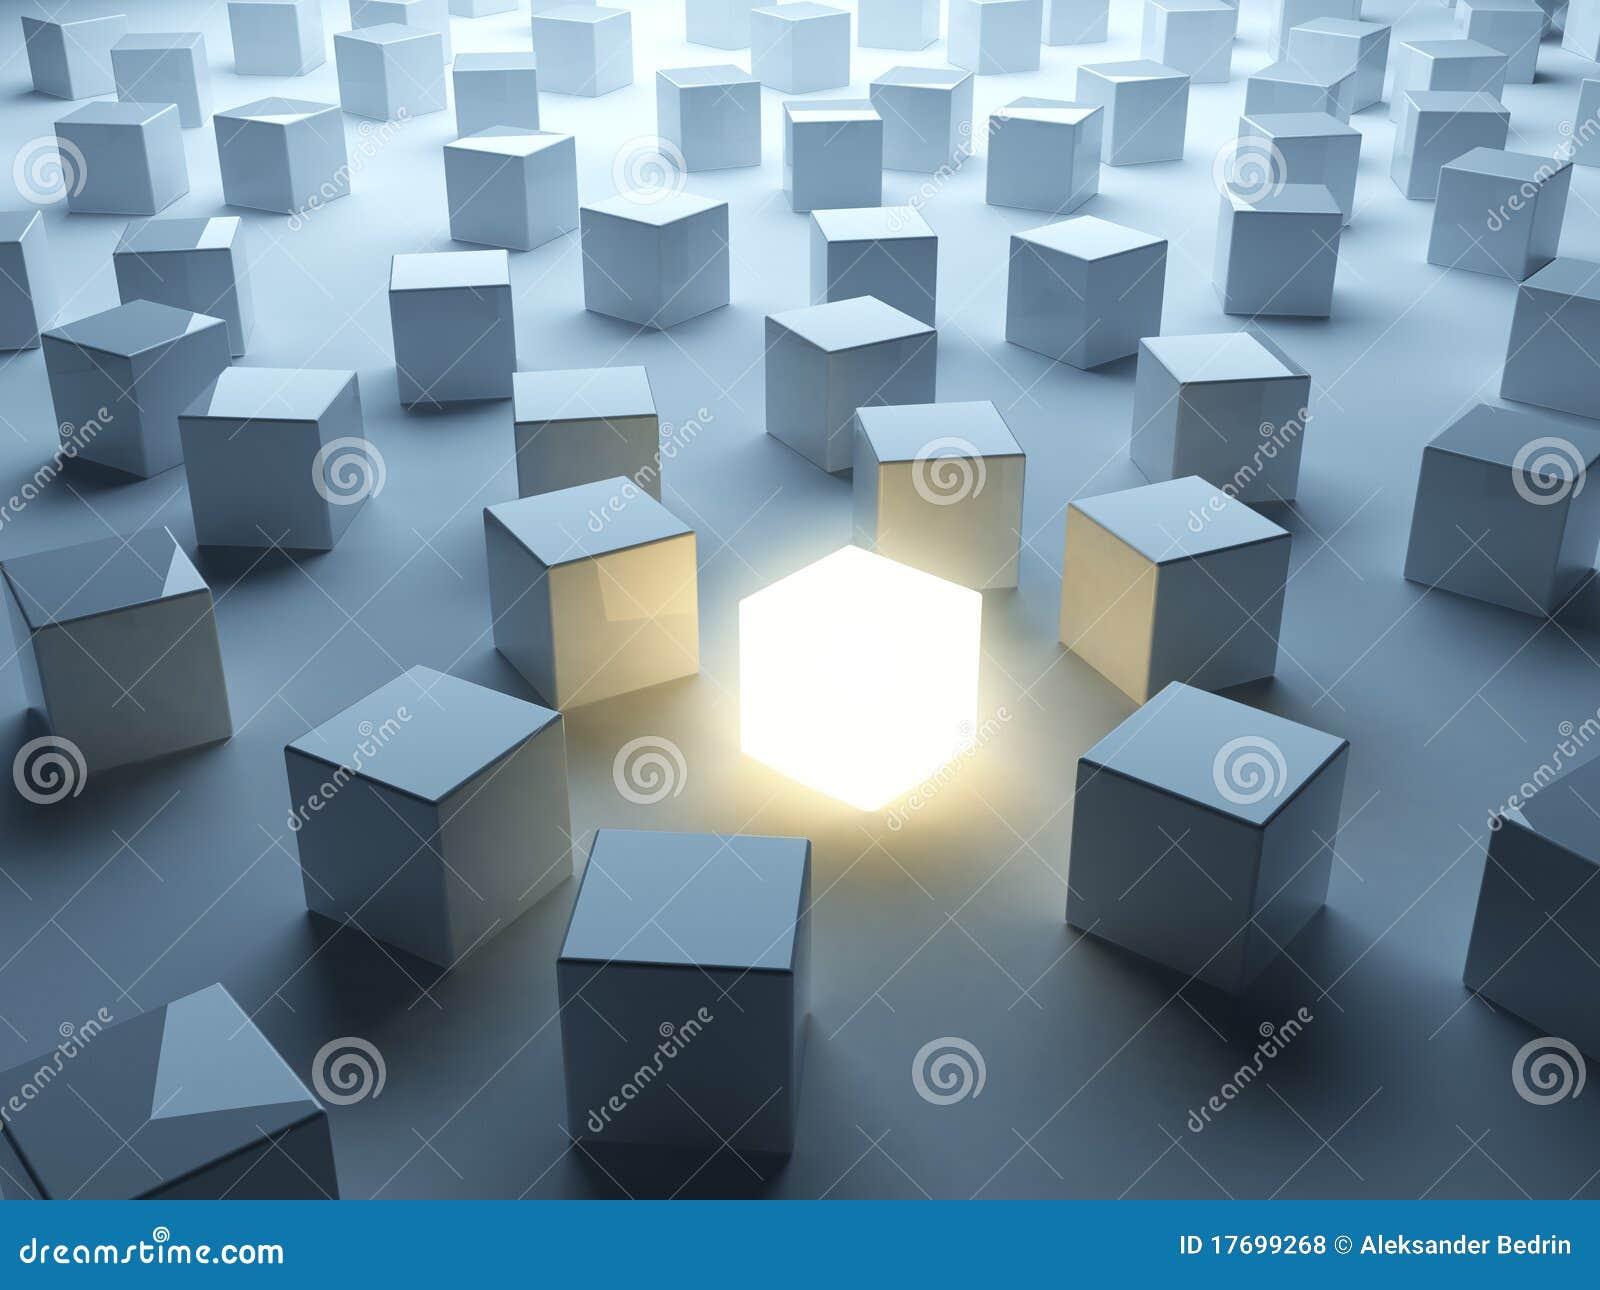 Lichtgevende kubus. Individualiteit